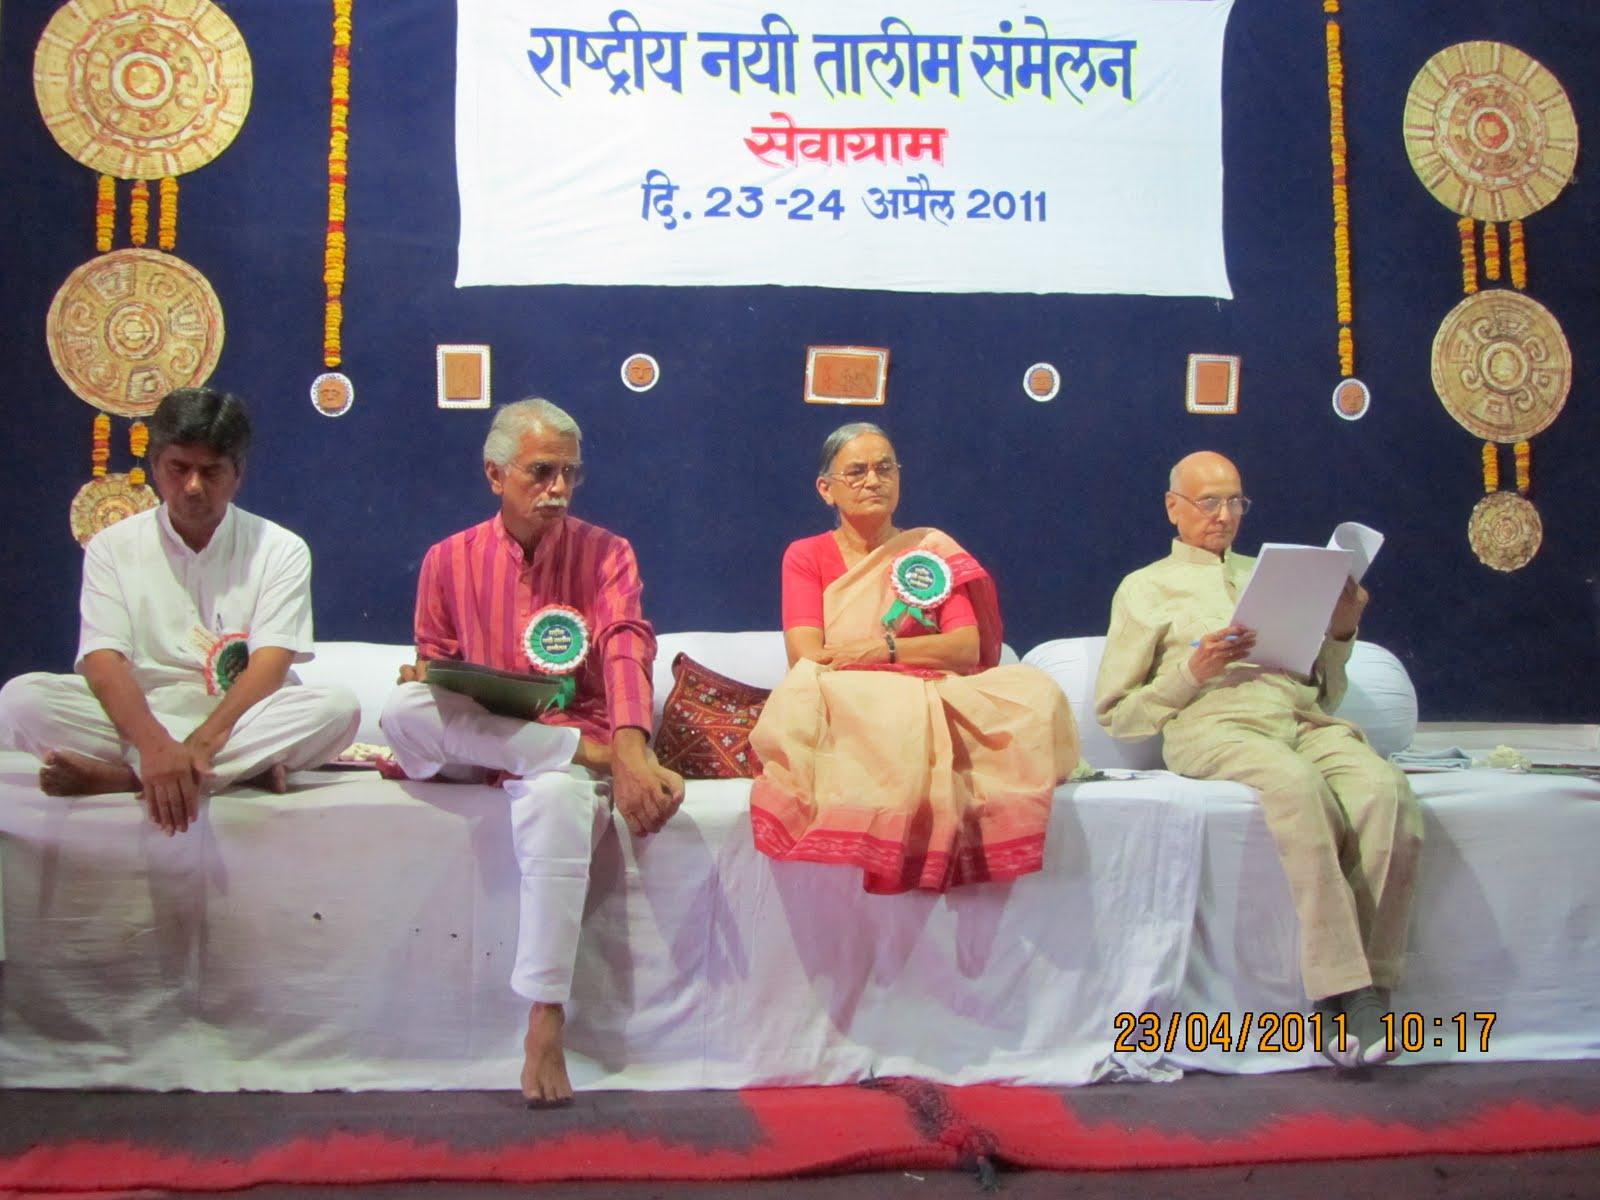 nai talim Abstract: samir banerji will speak on 'education in gandhian praxis' he will first  make a small presentation of gandhi's 'nai talim/basic.